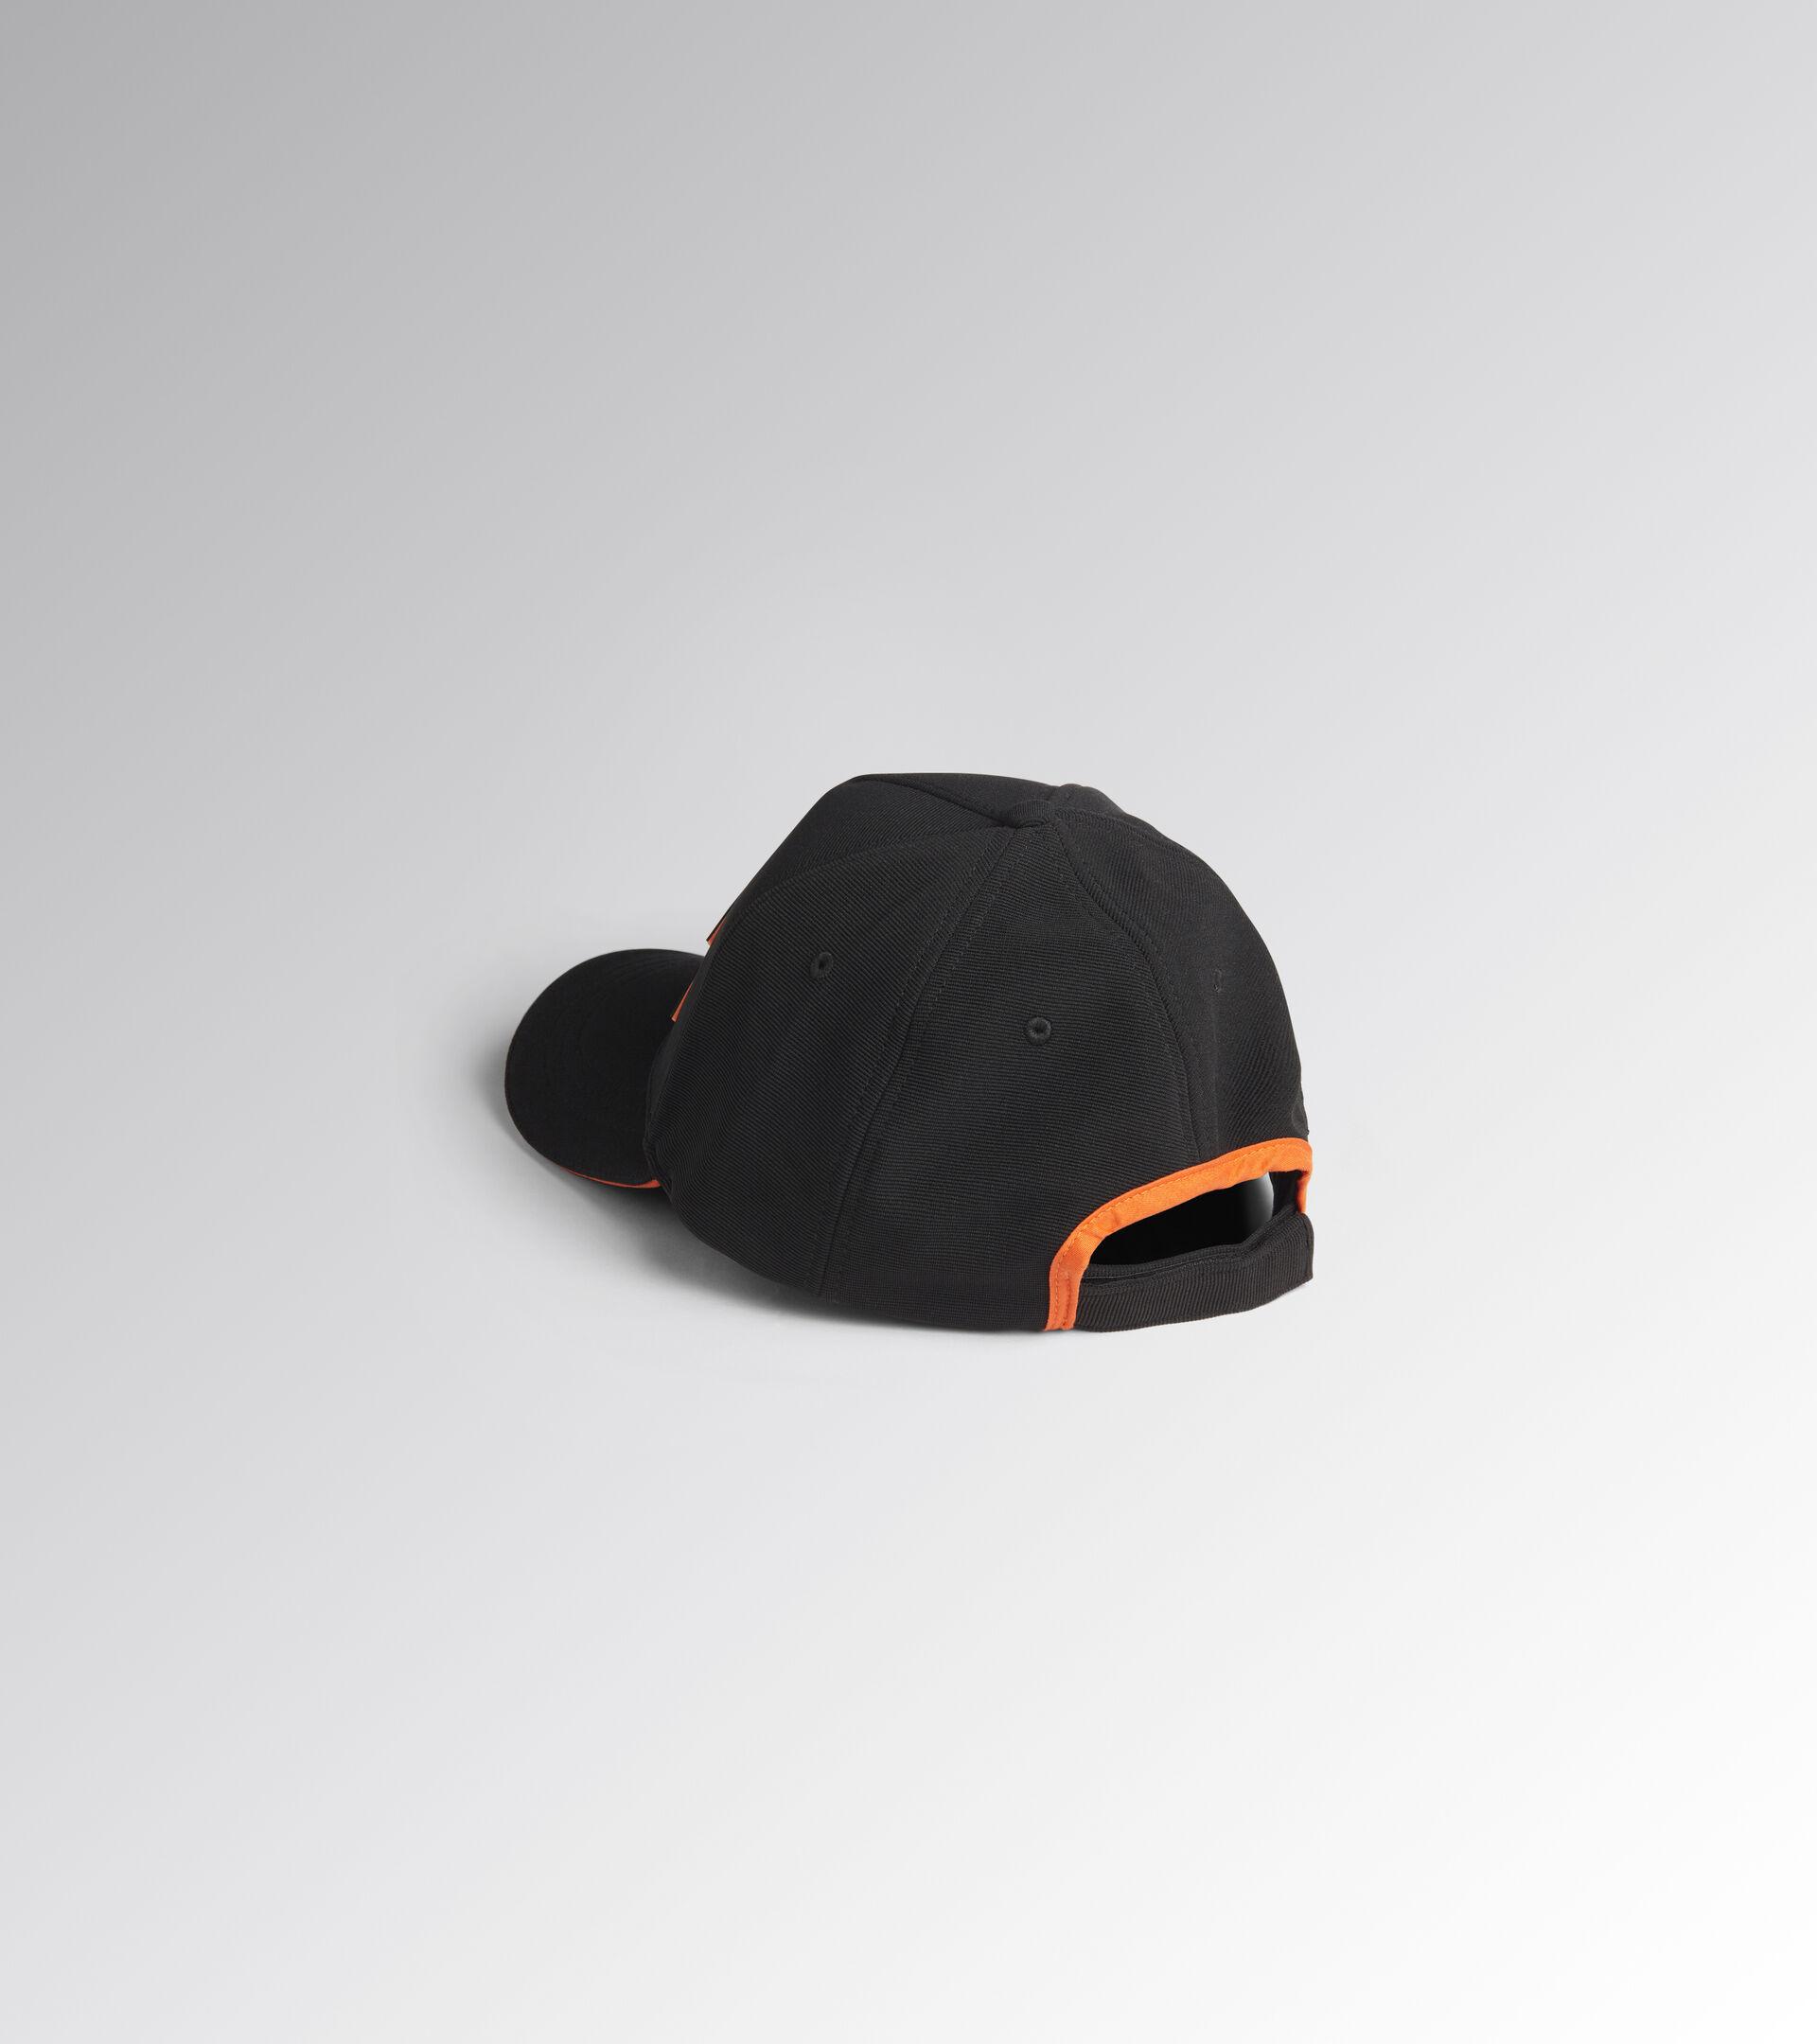 Accessories Utility UNISEX BASEBALL CAP BLACK Utility